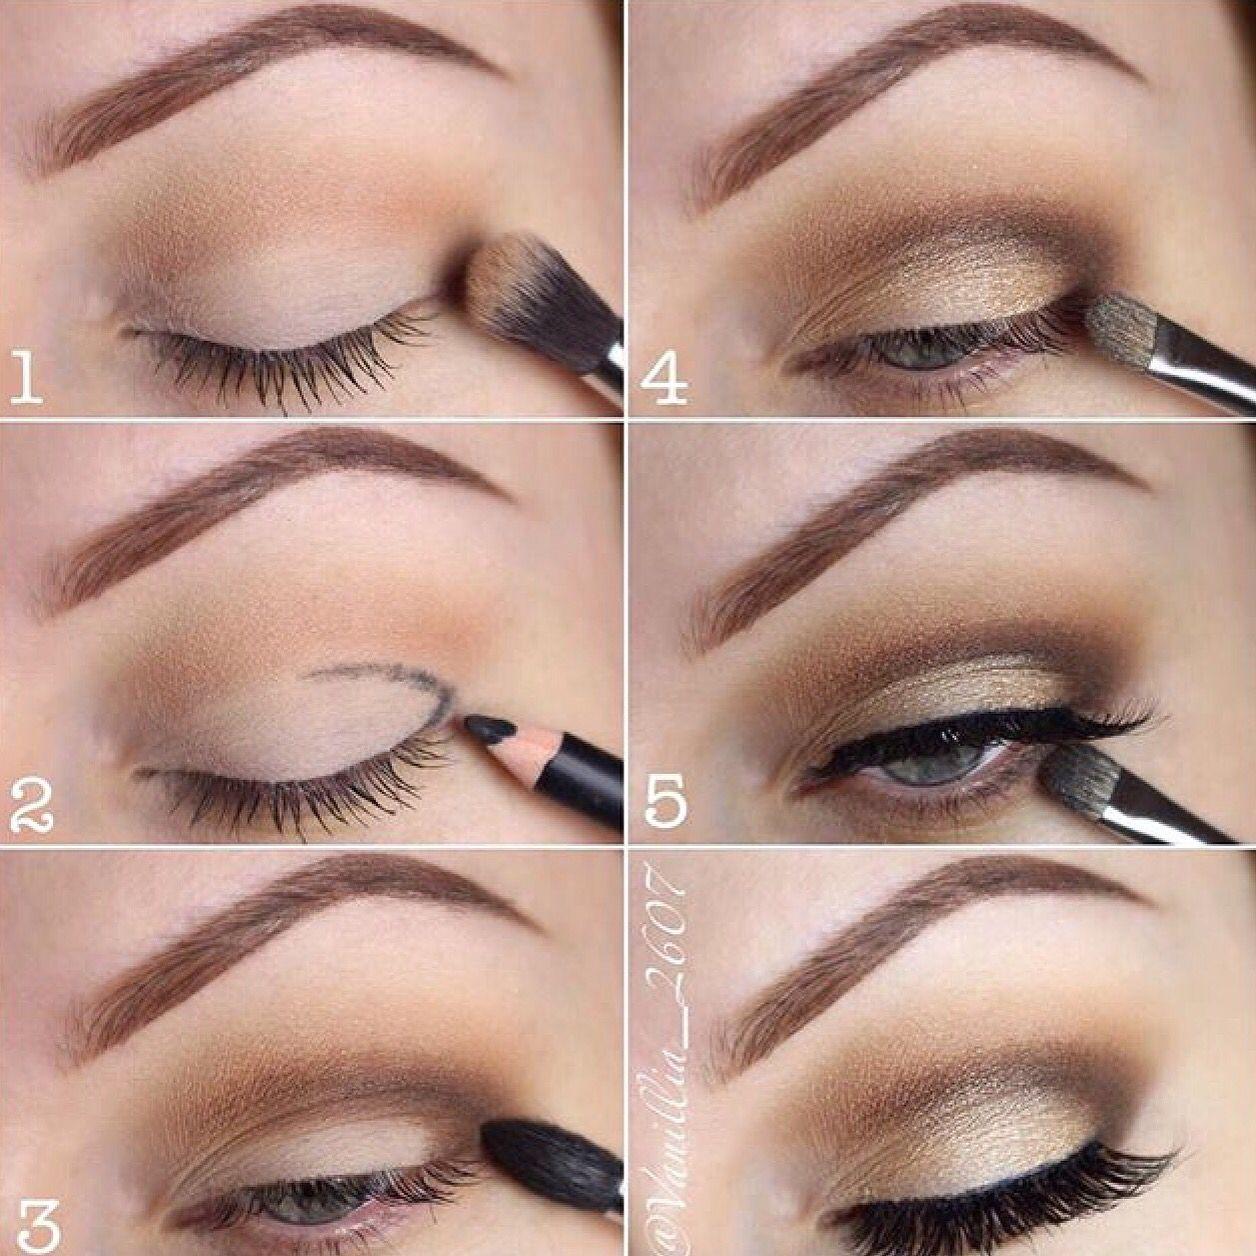 Eye makeup tutorial using Lotus Lashes No. 504 #eyeshadow #eyelashes #eyeliner